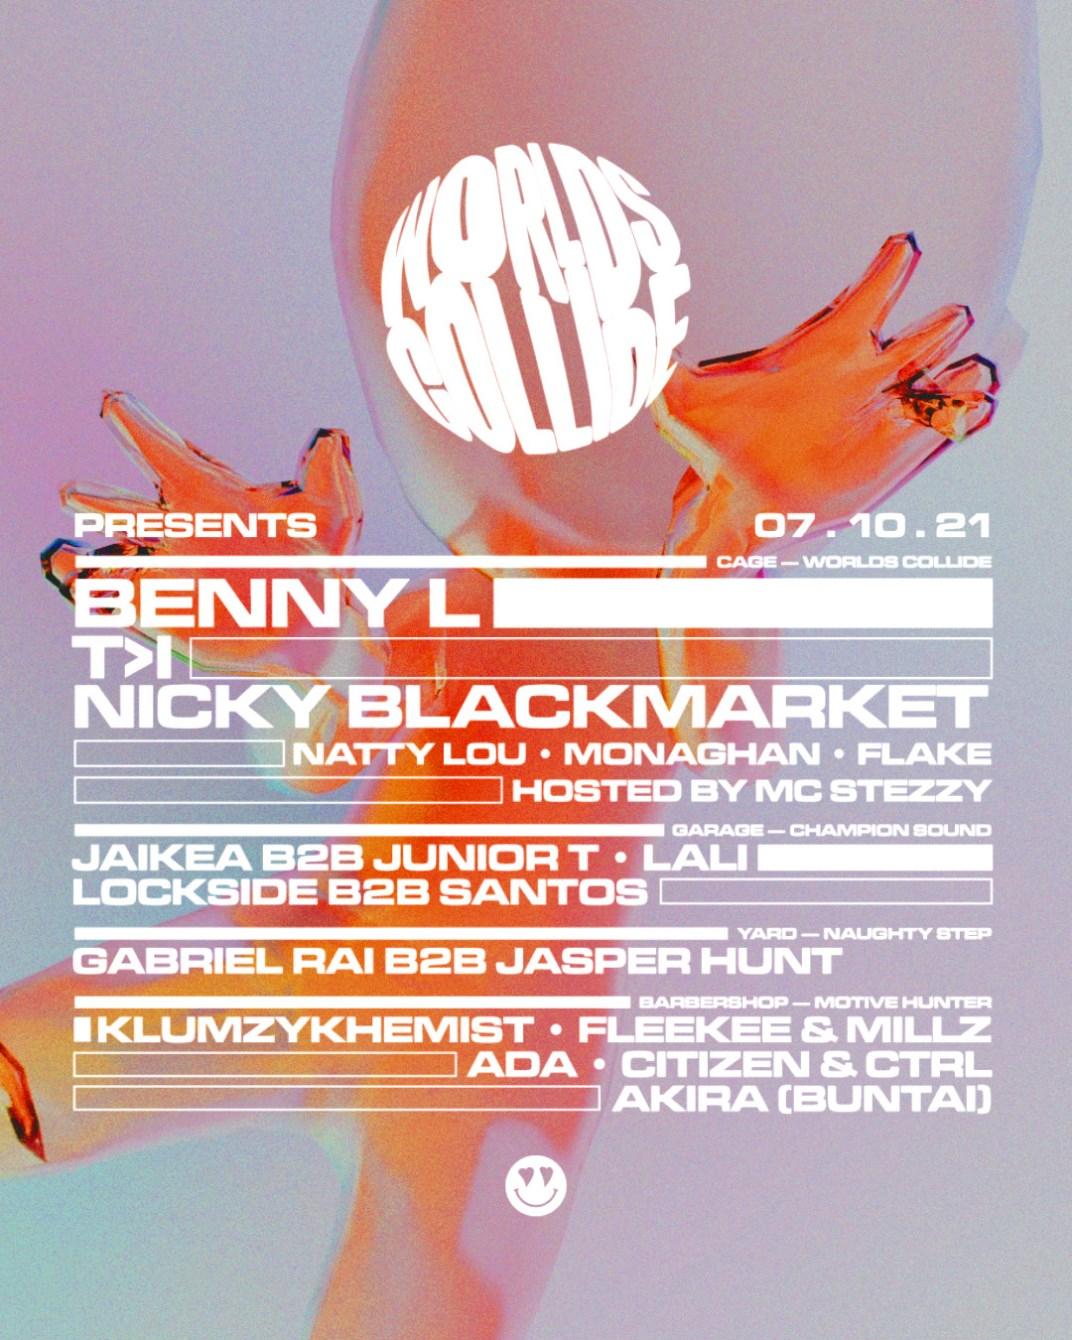 Worlds Collide presents Benny L, T>I, Nicky Blackmarket, Champion Sound, Naughty Step - Flyer front